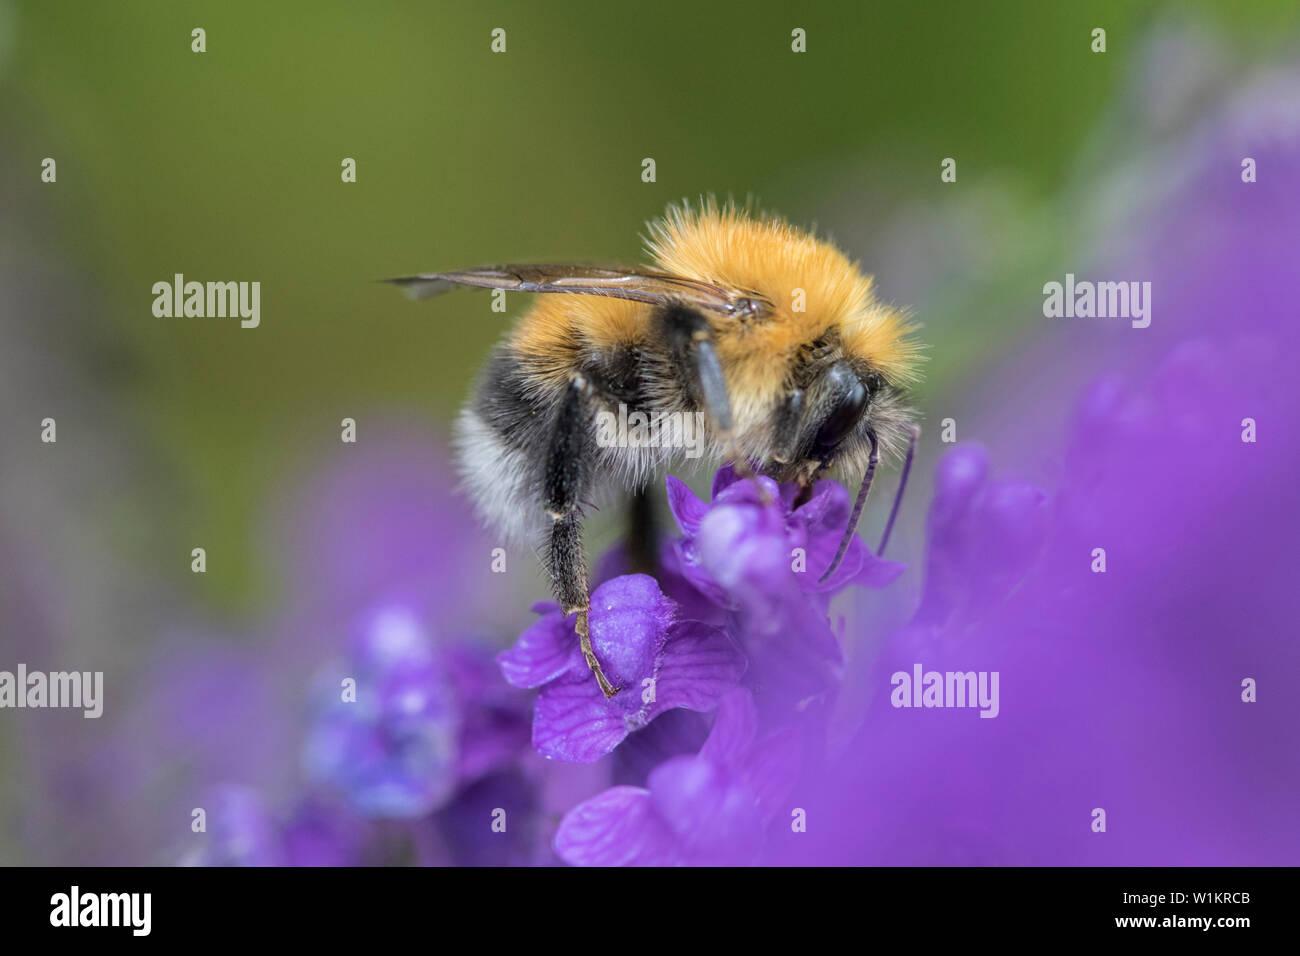 Bumble Bee on lavender, England, UK - Stock Image